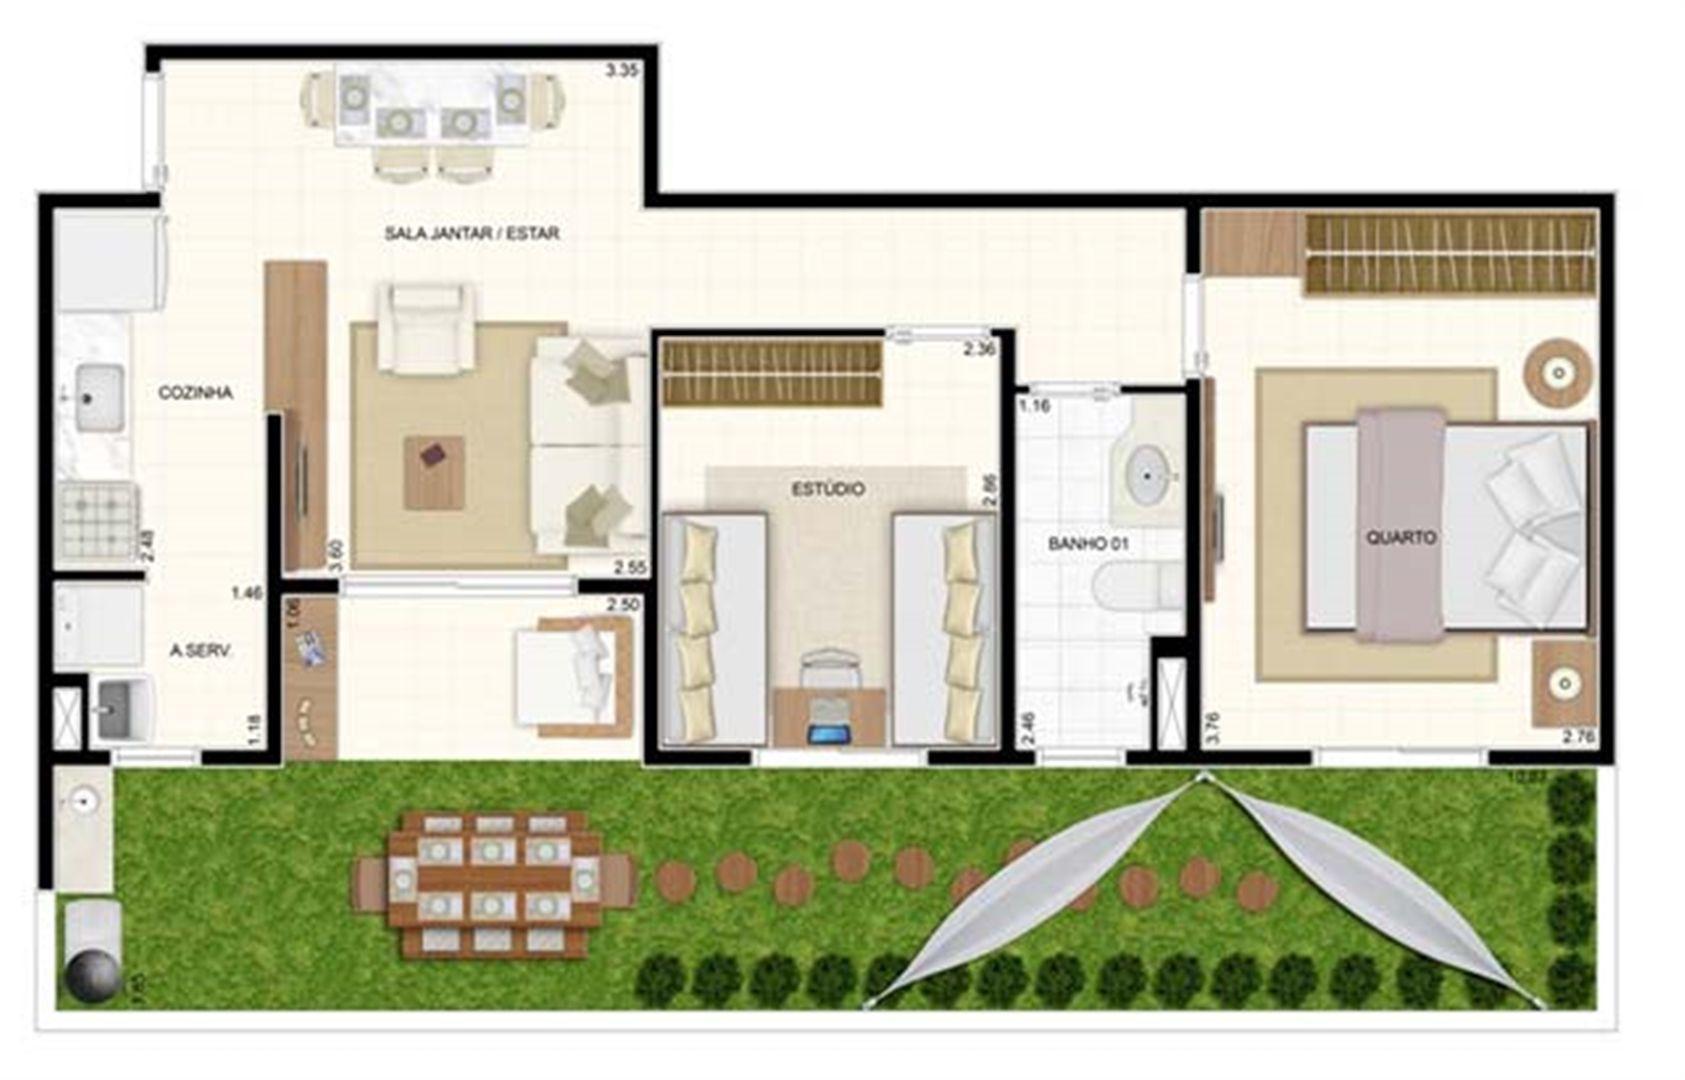 Giardino 2 dorms 70m²   Vita 2 Residencial Clube – Apartamento no  Pitimbu - Natal - Rio Grande do Norte